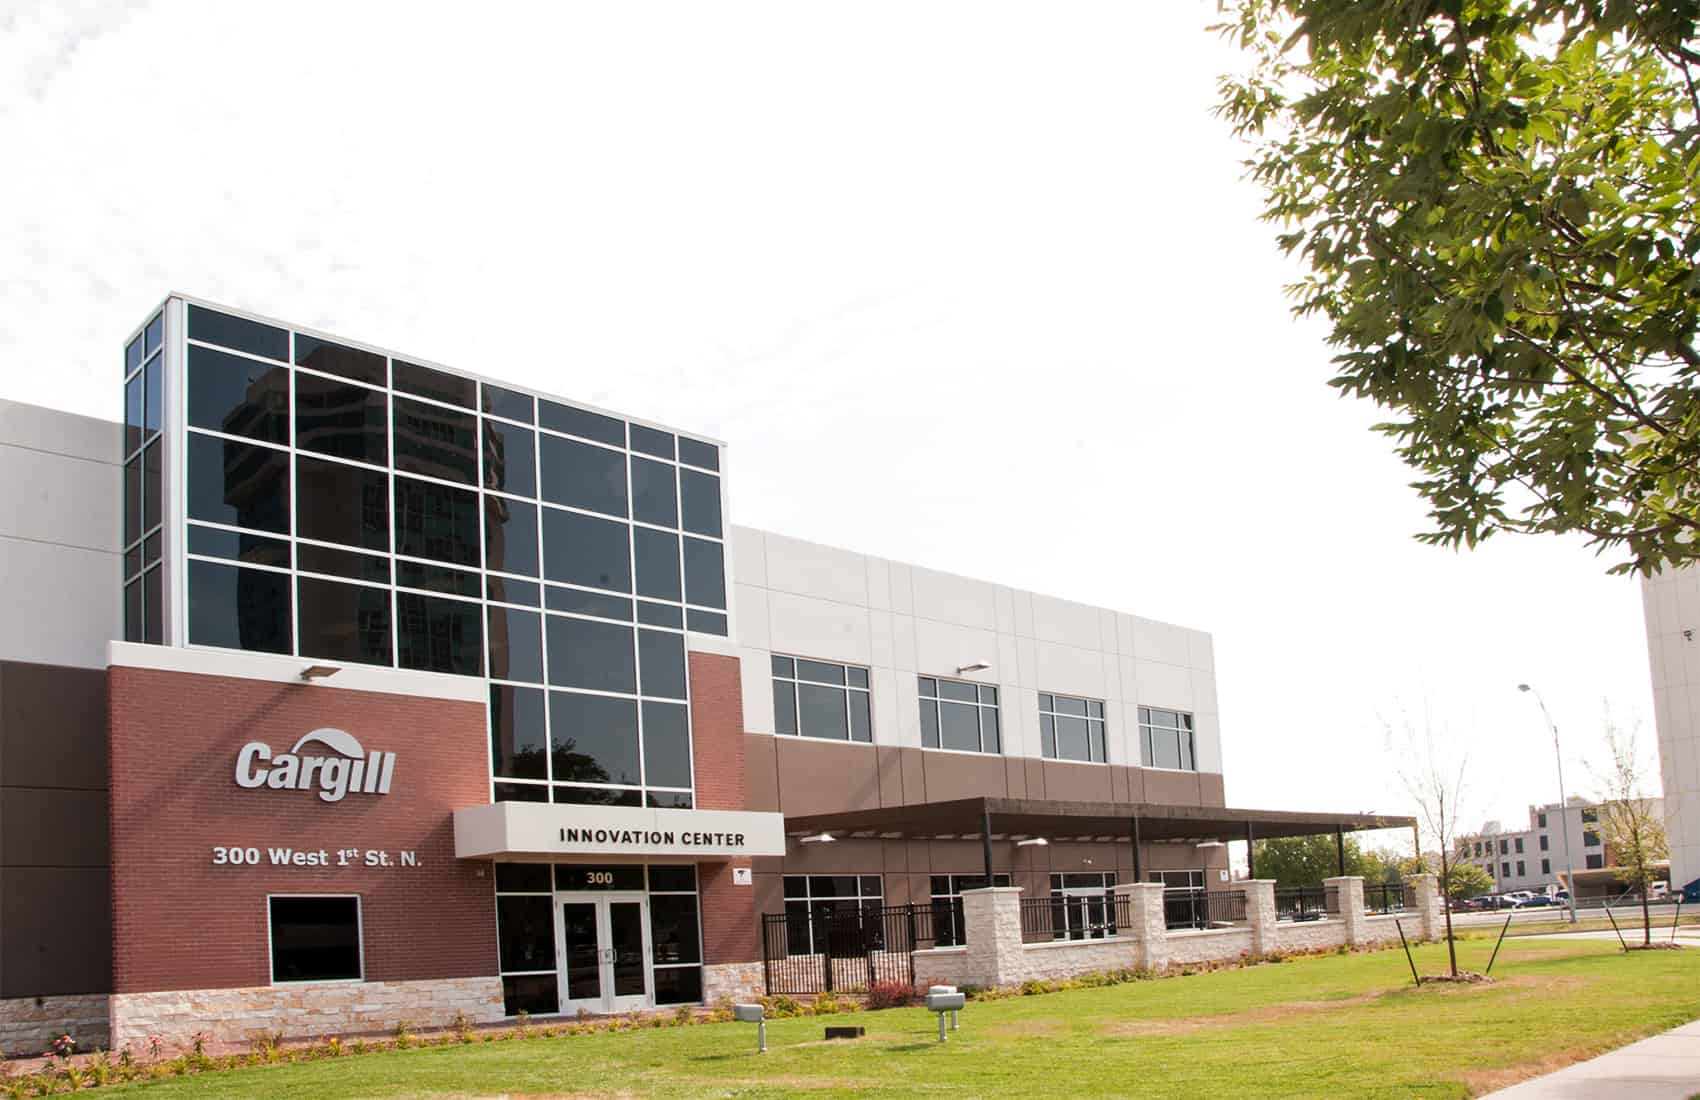 Cargill facilities in Wichita